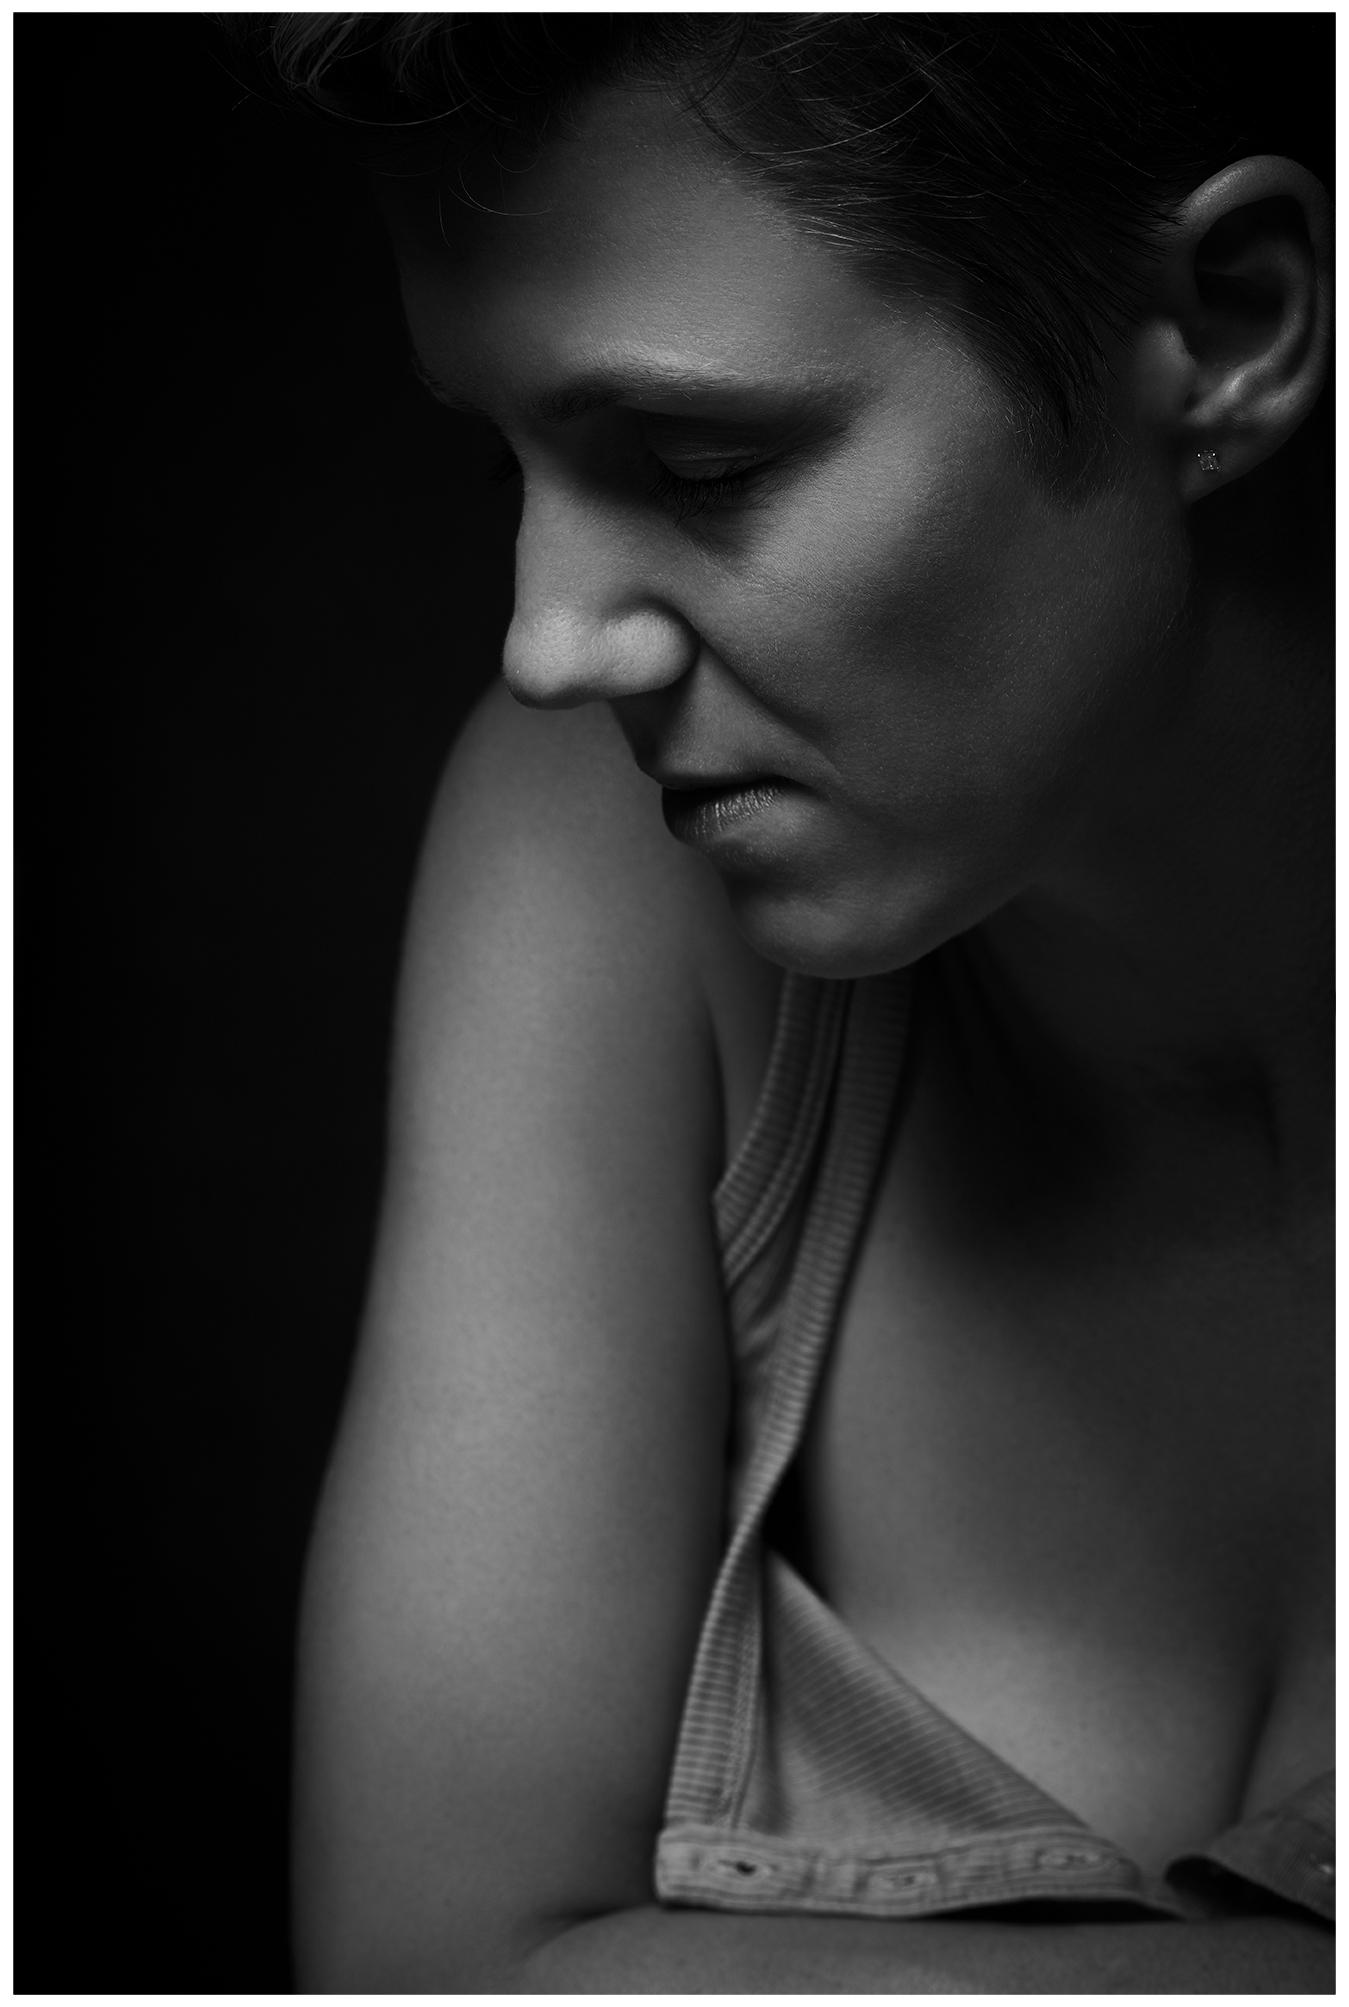 Justyna quiet.jpg